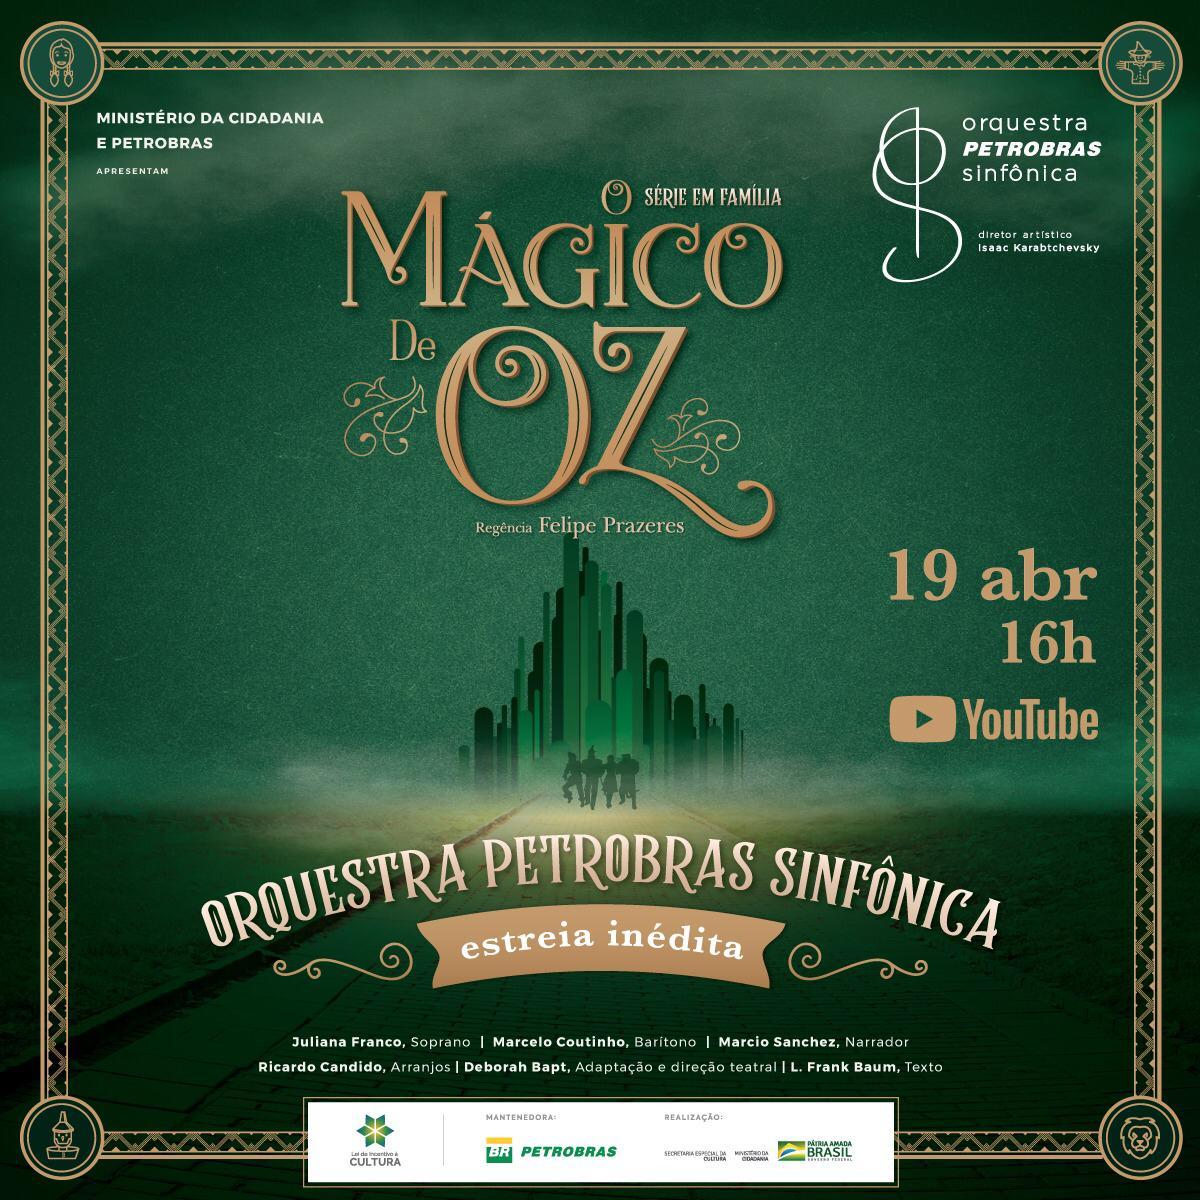 Magico de Oz 2019